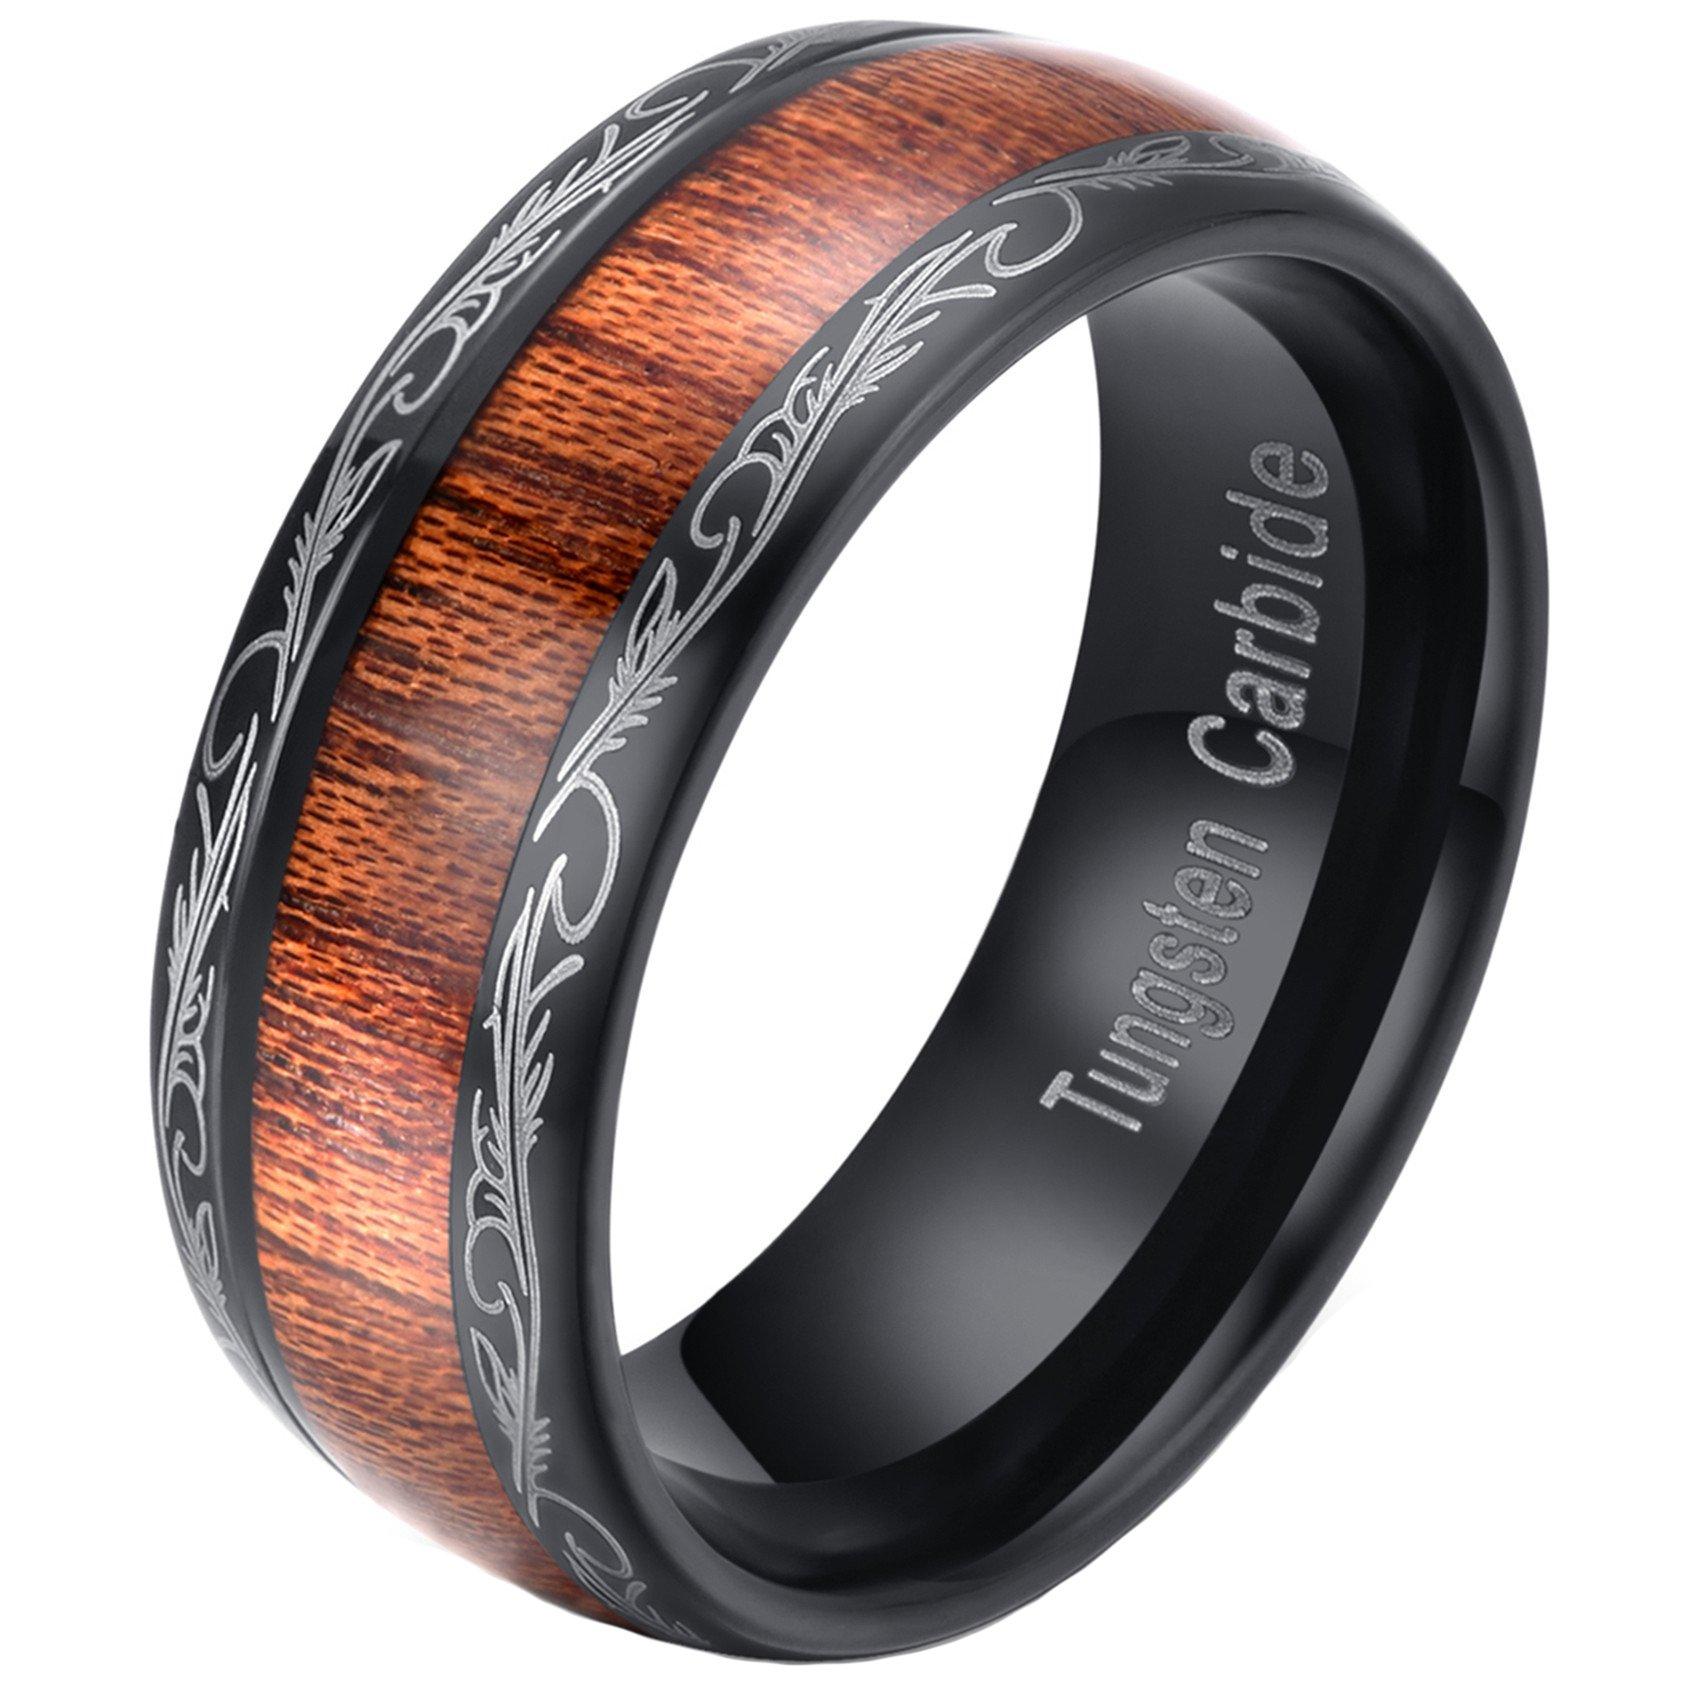 Mens Womens 8mm Black Tungsten Carbide Ring Wedding Engagement Band Grain Lasered Edges KOA Wood Inlay Comfort Fit (13)